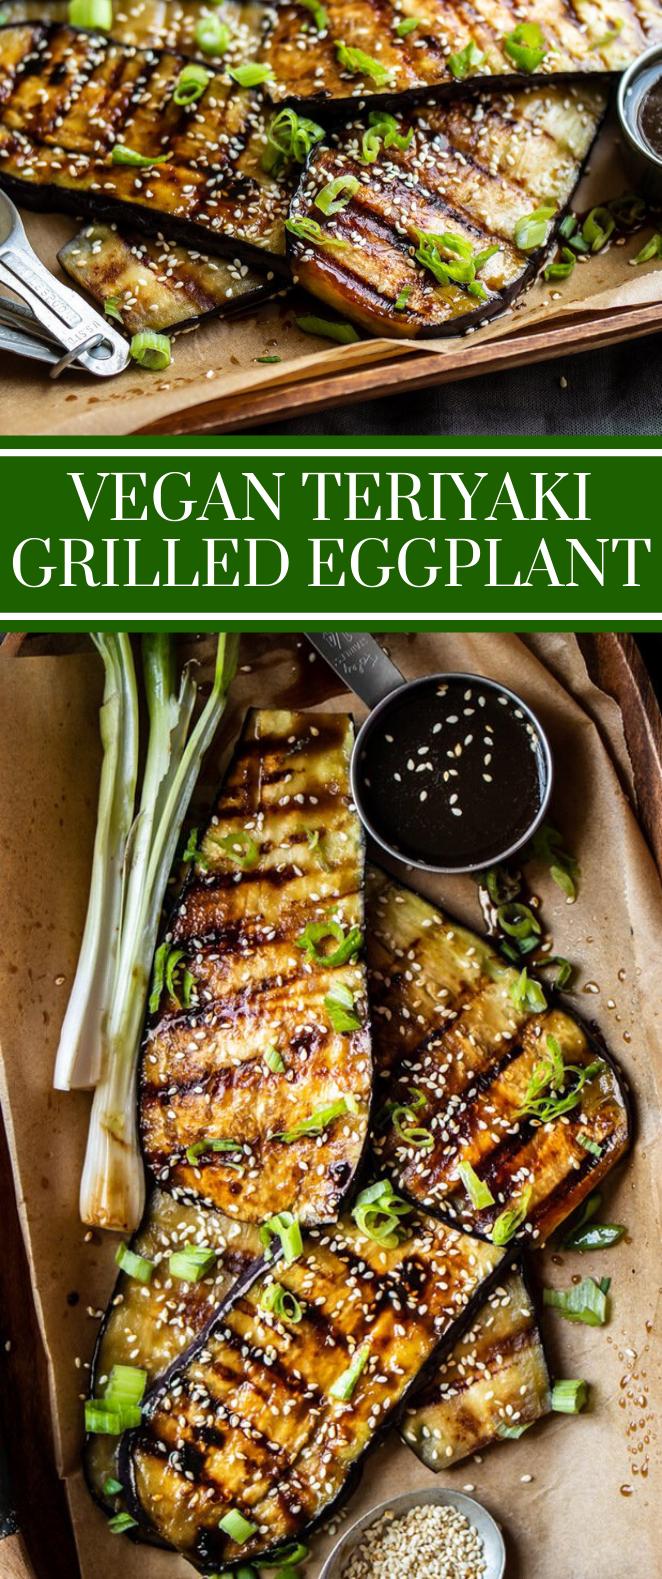 Vegan Teriyaki Grilled Eggplant #vegandinner #vegetarian #vegetariangrilling Veg - Nicole&DinnerRecipesCrockpot